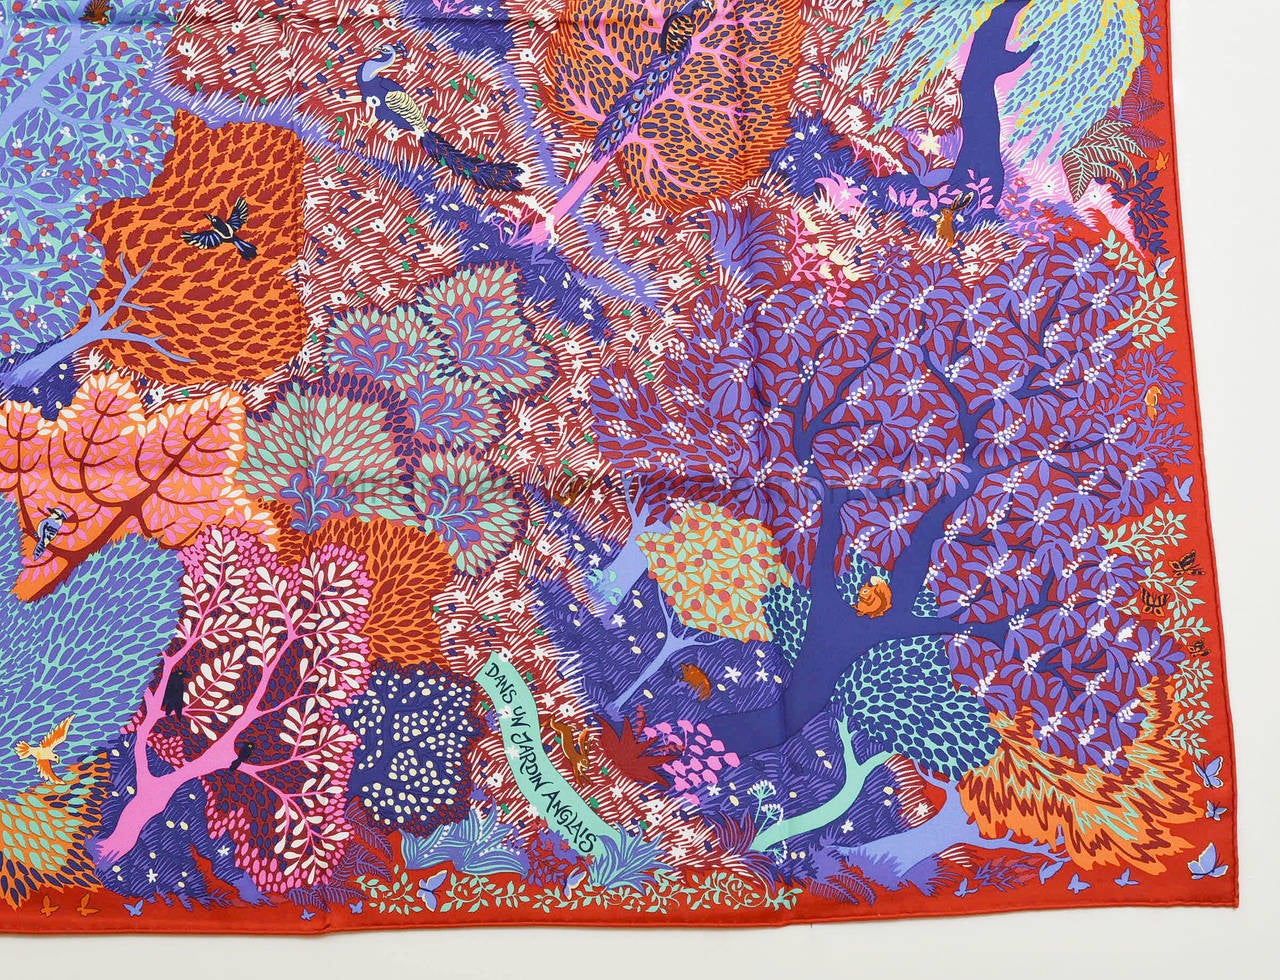 Hermes carre twill dans un jardin anglais silk red purple for Dans un jardin anglais twilly